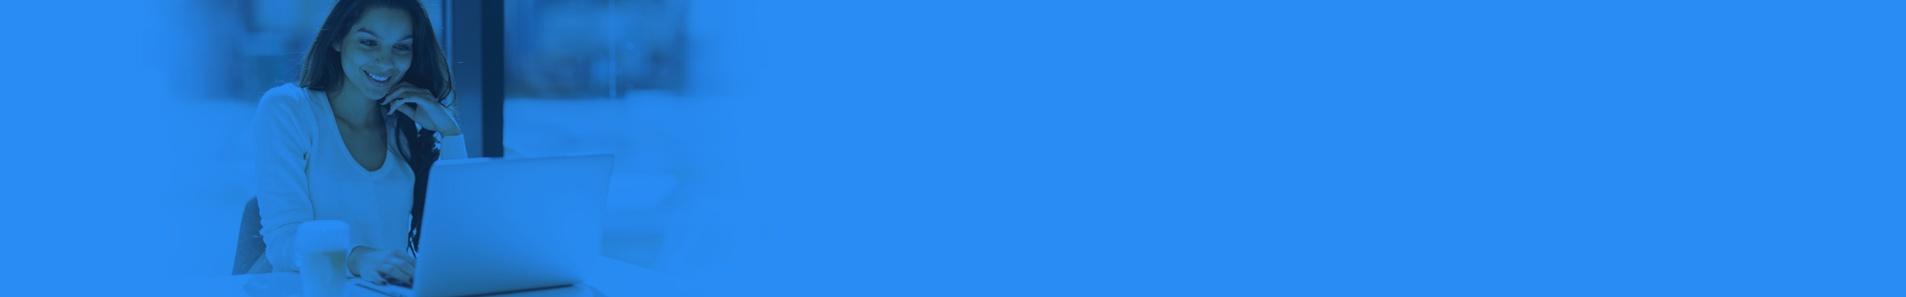 RealVNC-Pillar-Page-V3_Banner.jpg